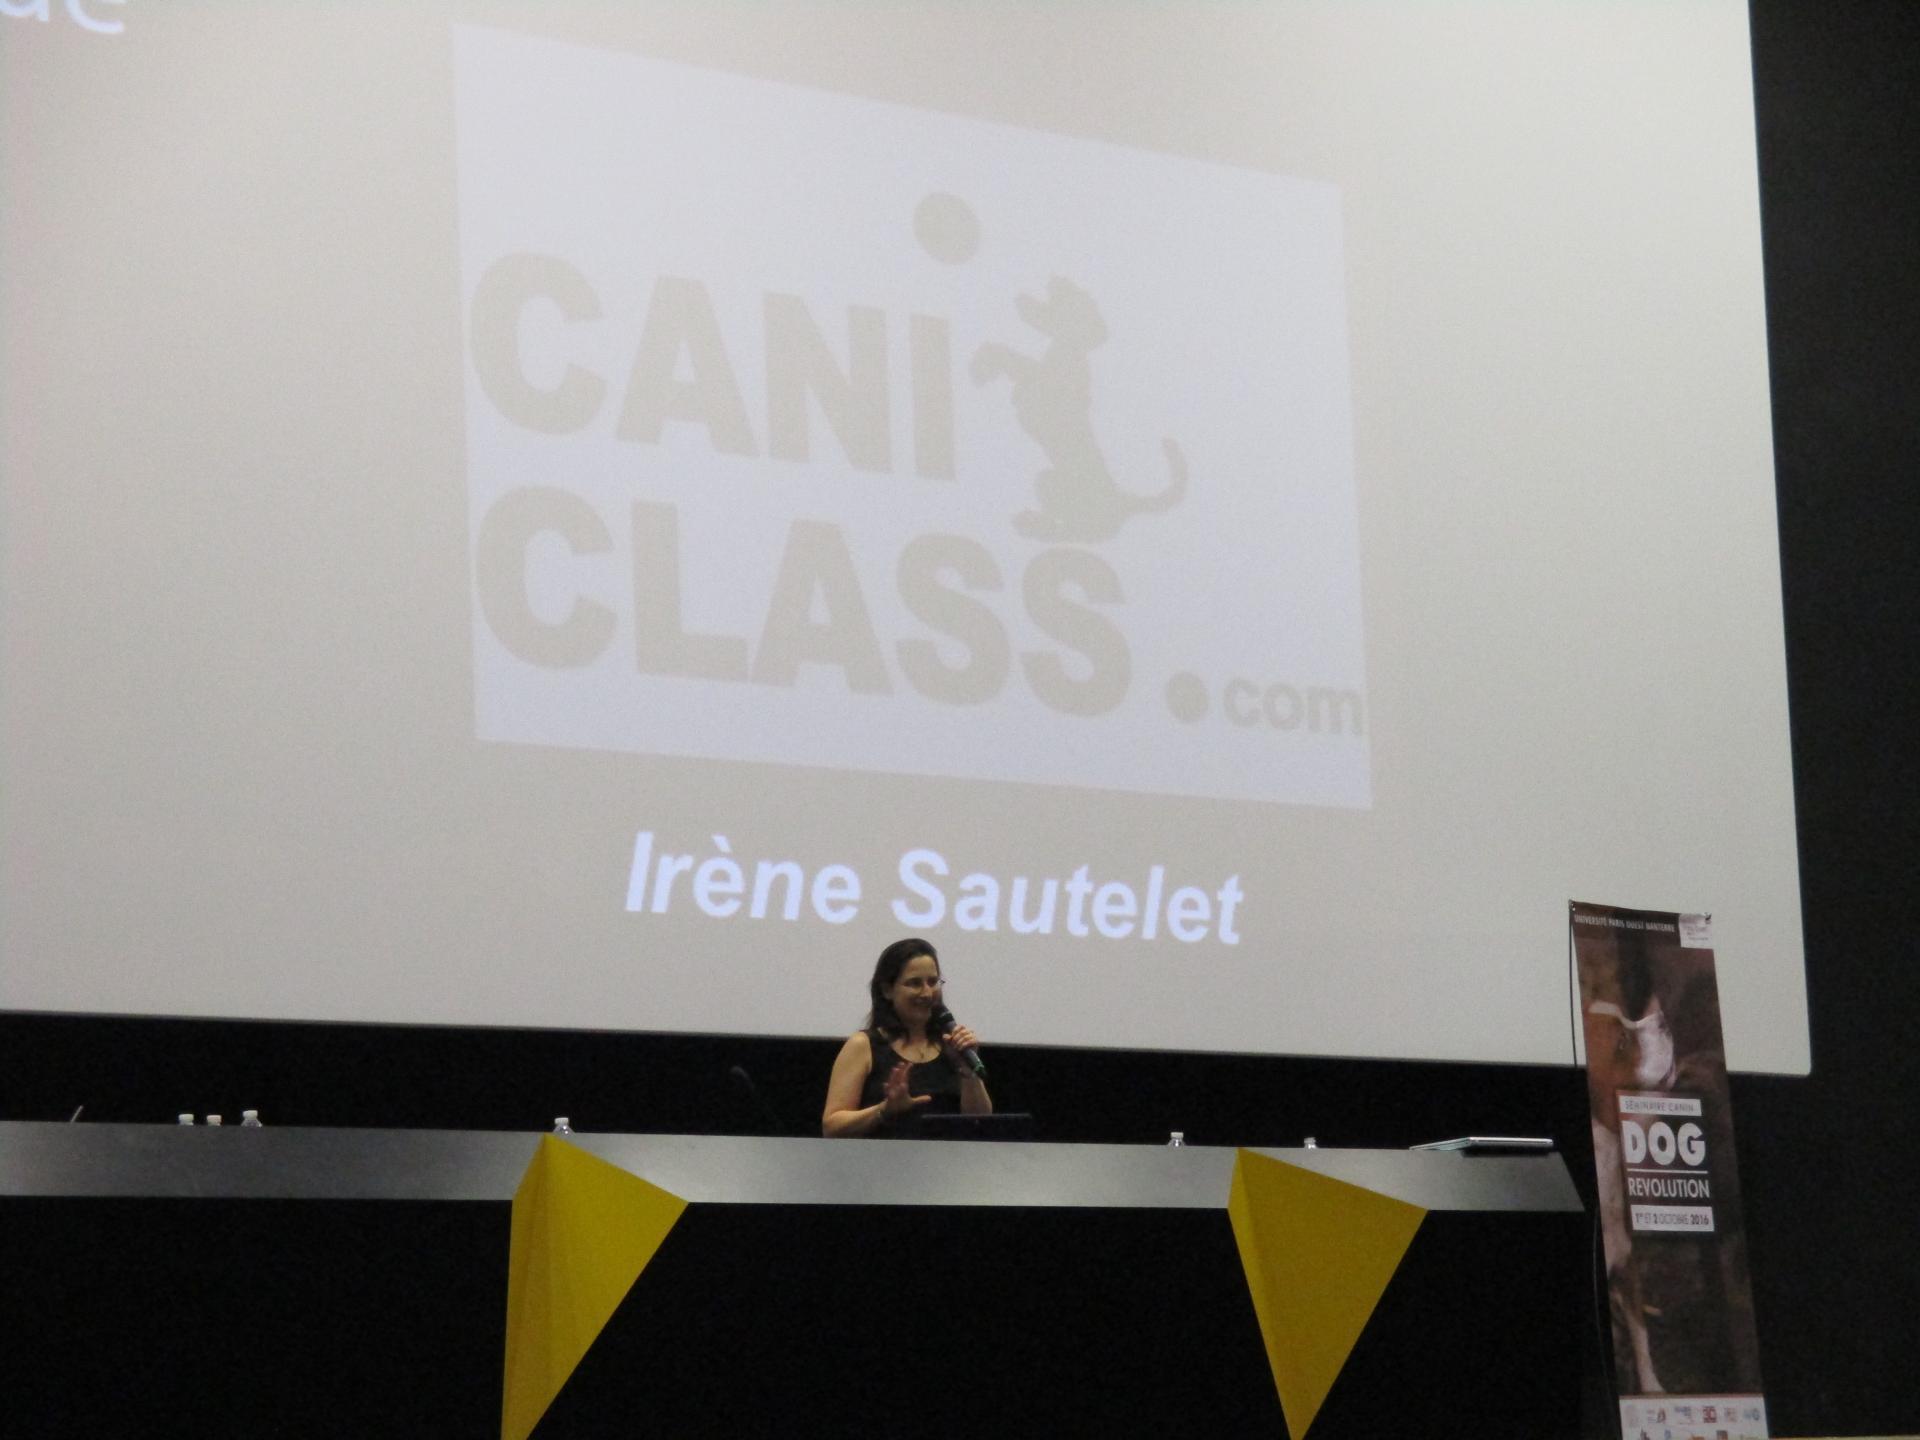 CANI CLASS intervention à Dog Revolution